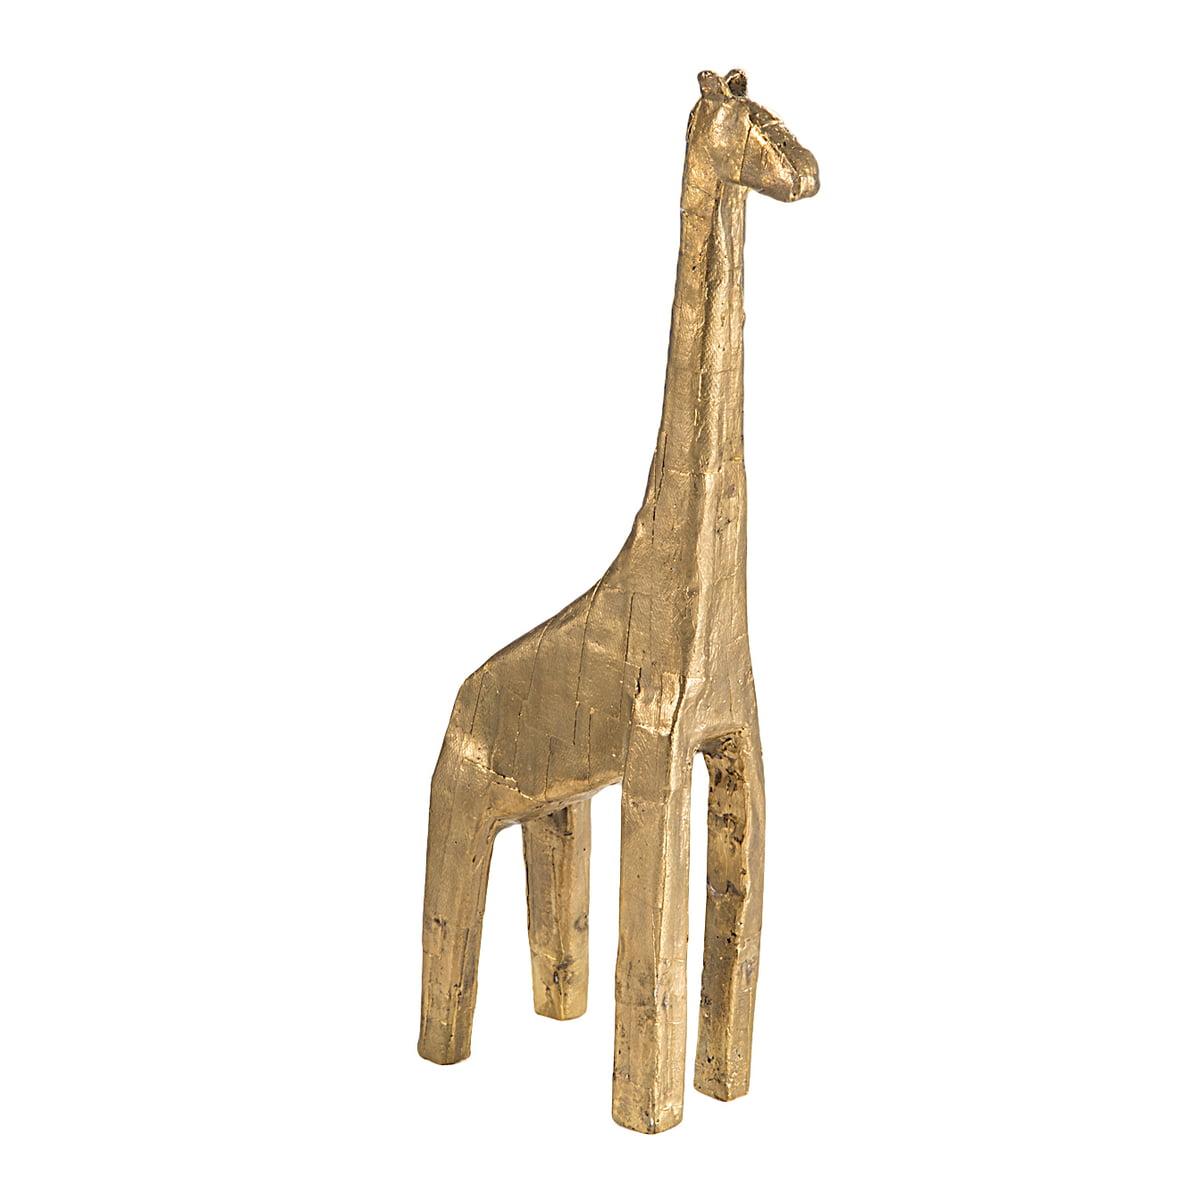 Pulpo - Dekofigur Giraffe, Bronze | Dekoration > Figuren und Skulpturen | Bronze | Bronze | Pulpo